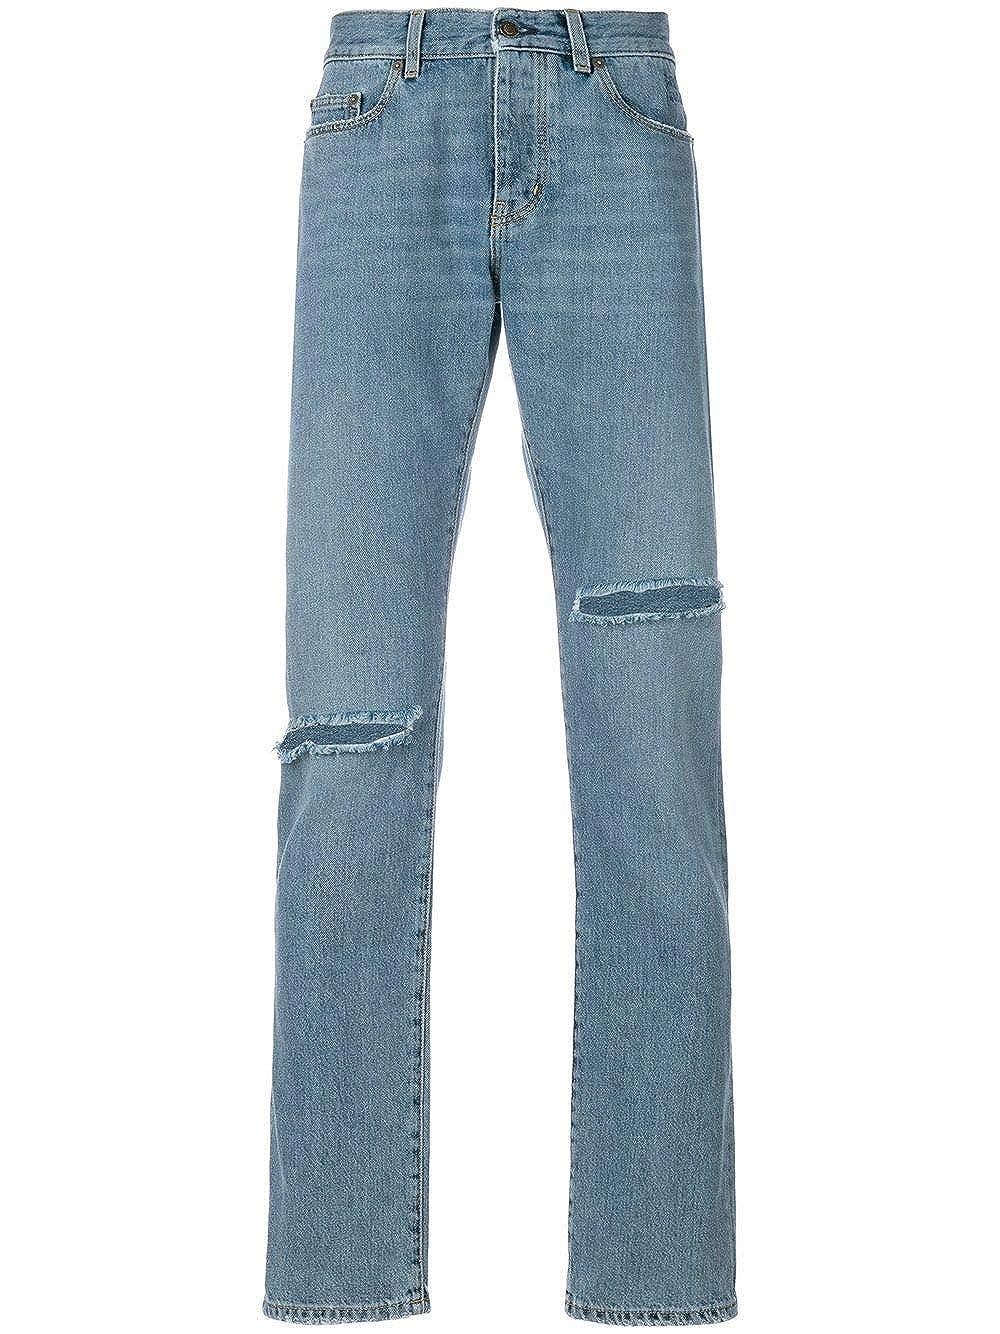 Saint Laurent Jeans Uomo Uomo Jeans 500723Y868M4061 Cotone Azzurro 5c6b4a 9784b427db9